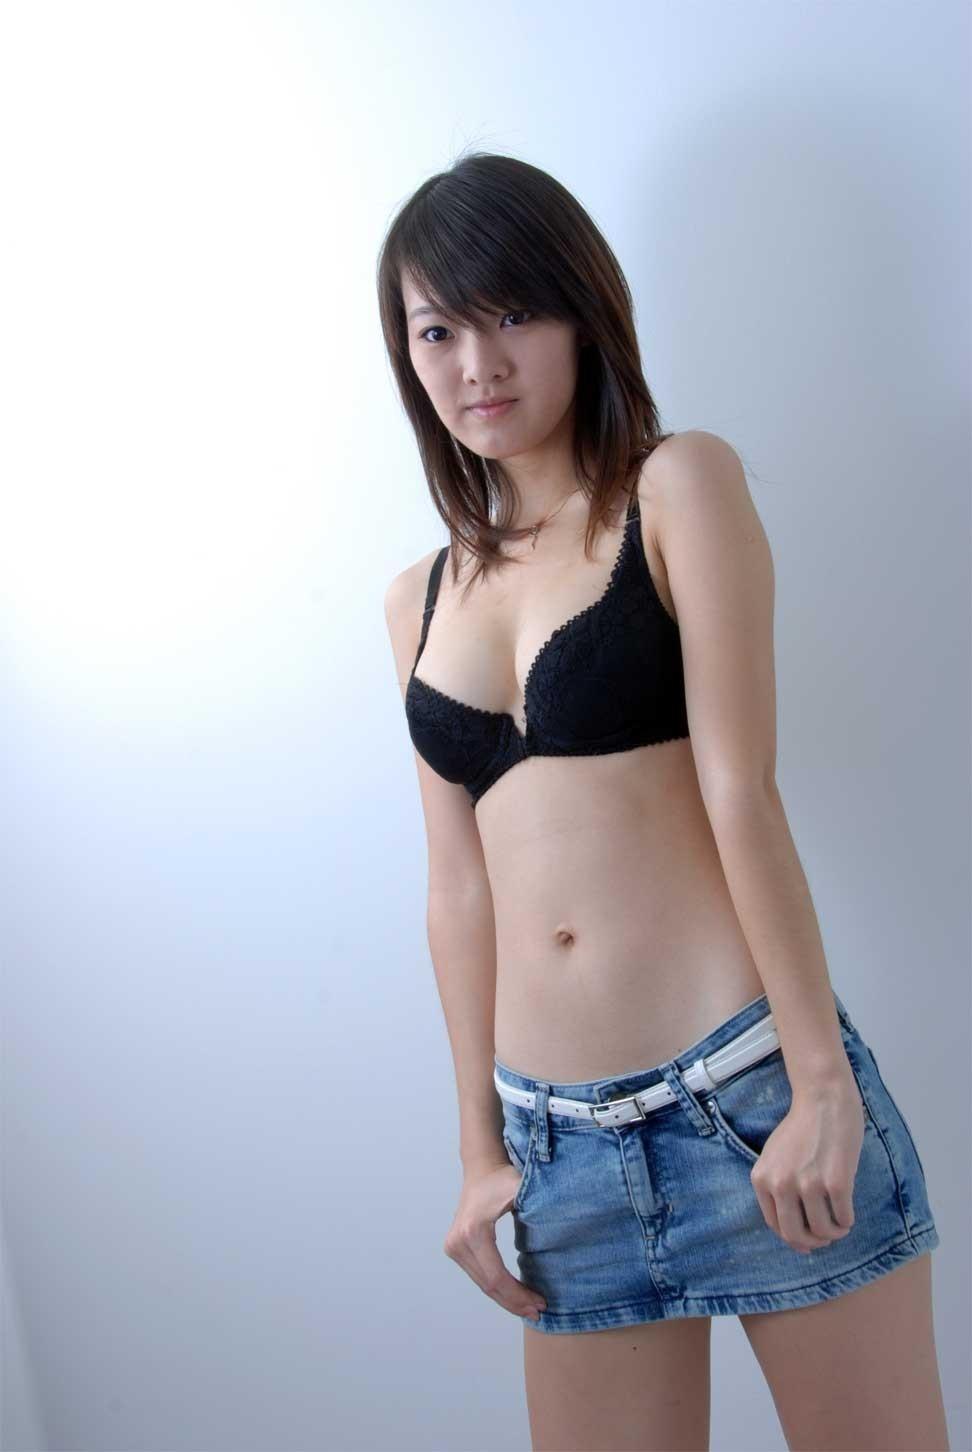 pimpandhost.com IMG fangruz.ru girl